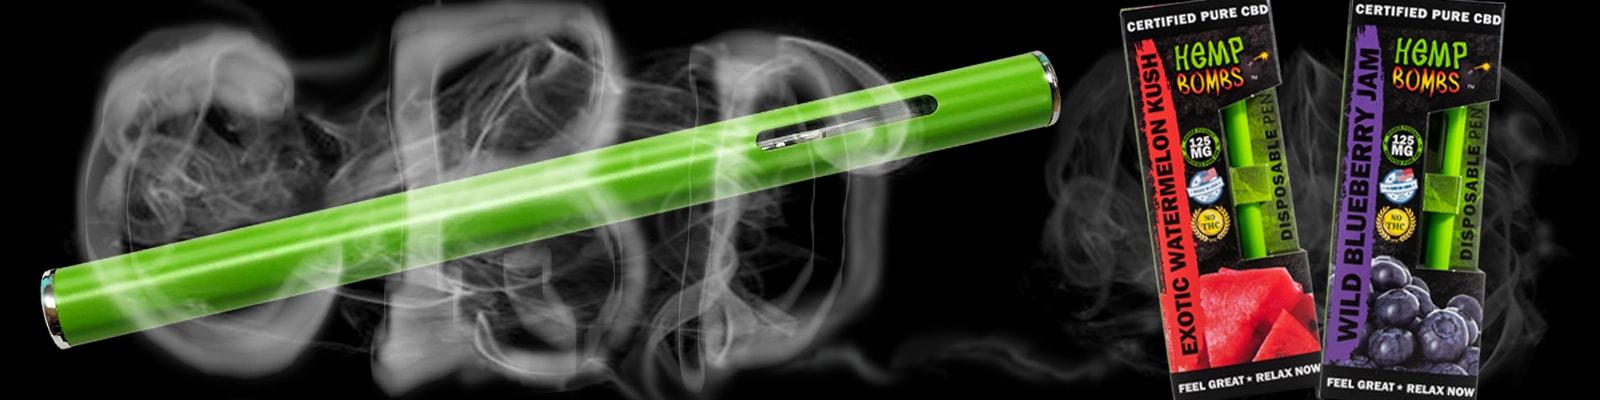 Hemp Bombs Premium CBD Vape Pen